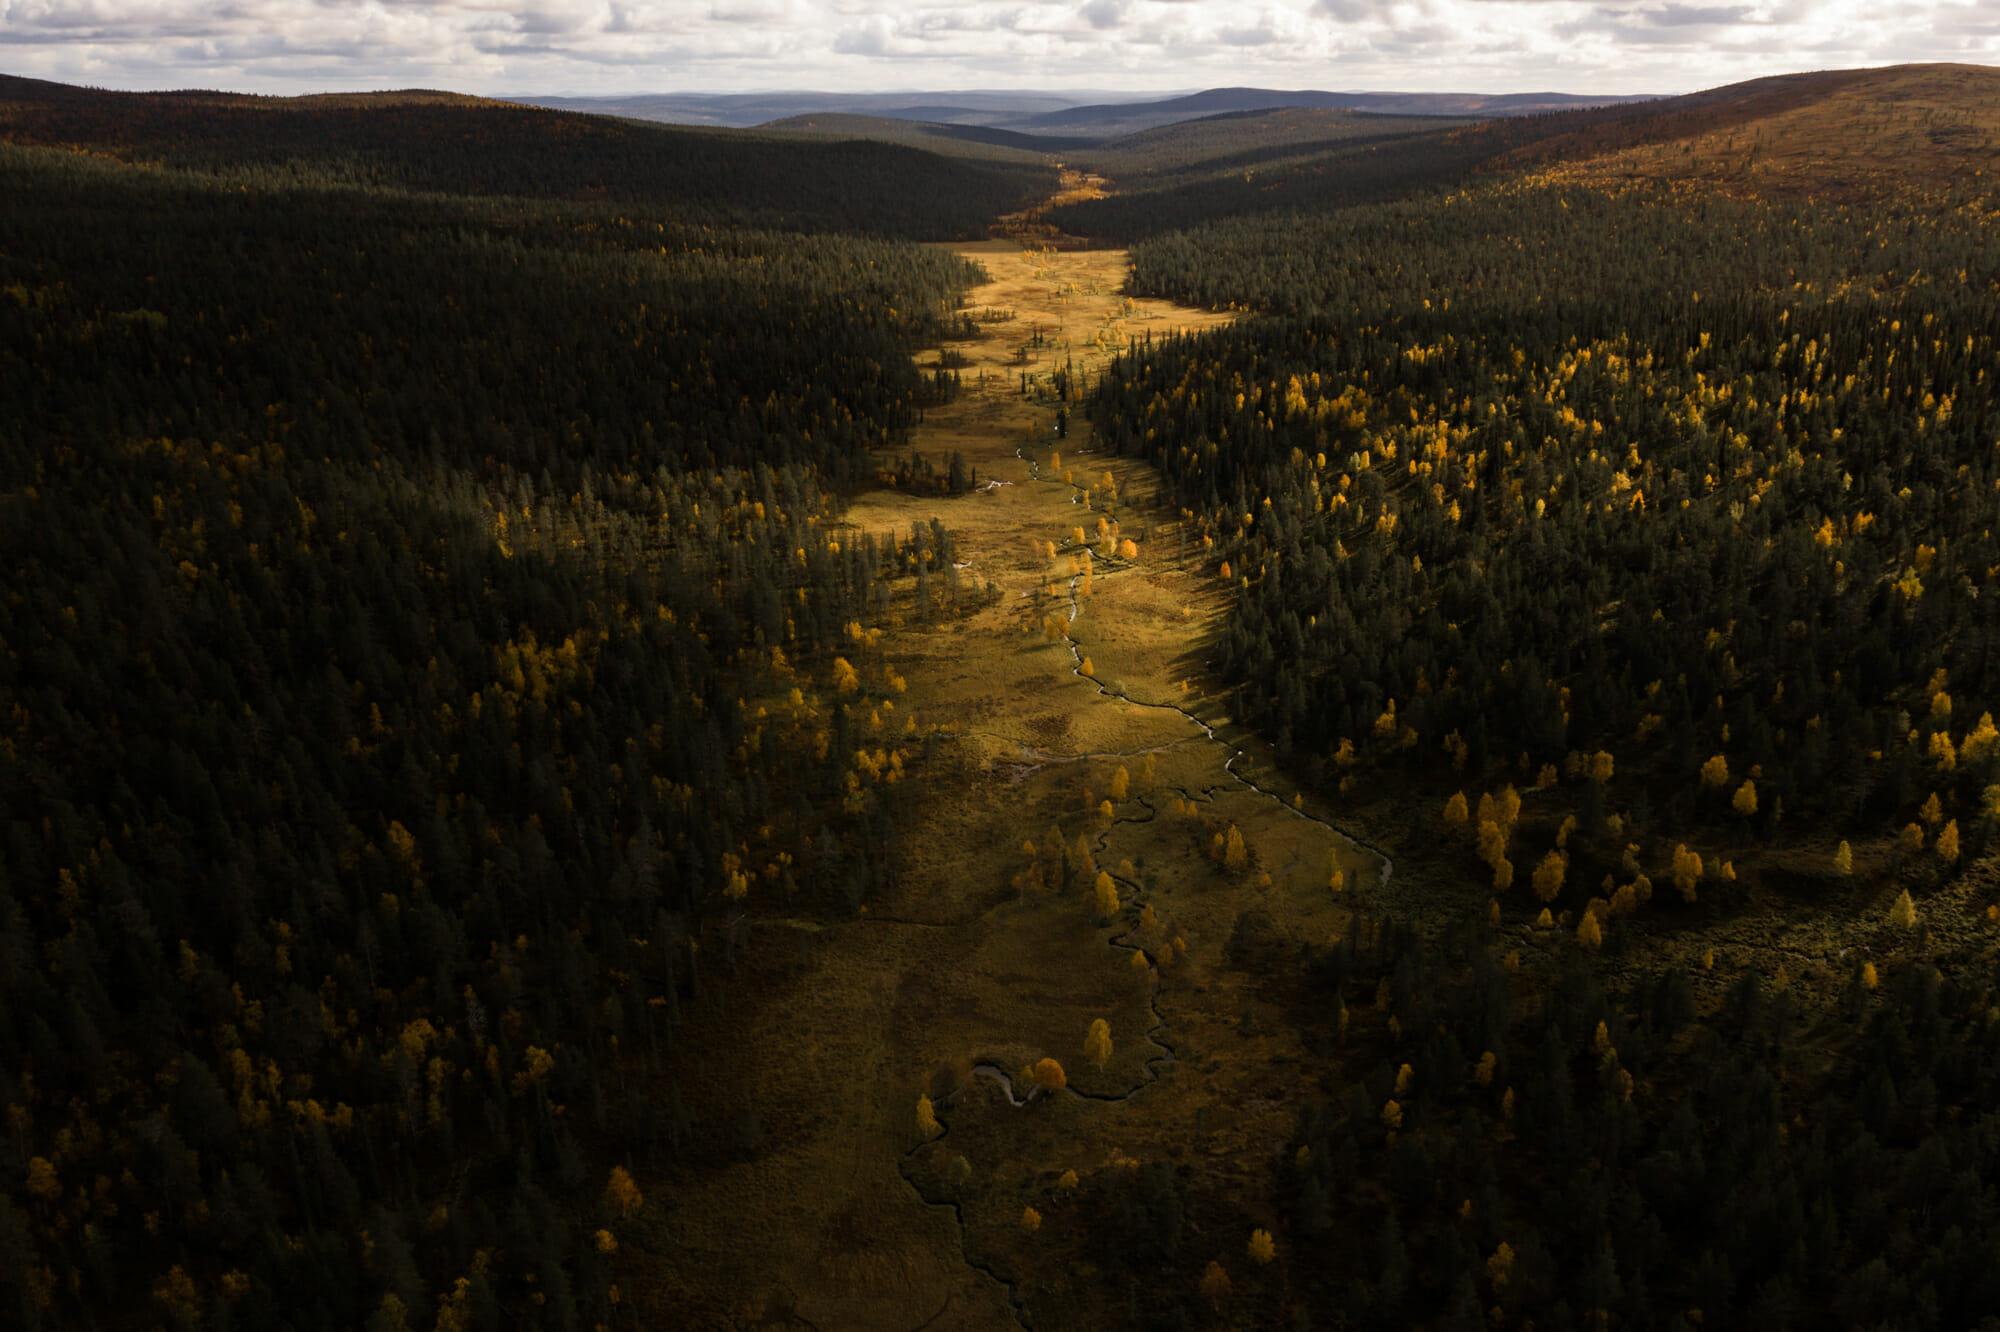 Horizon infini en Lapinie finlandaise